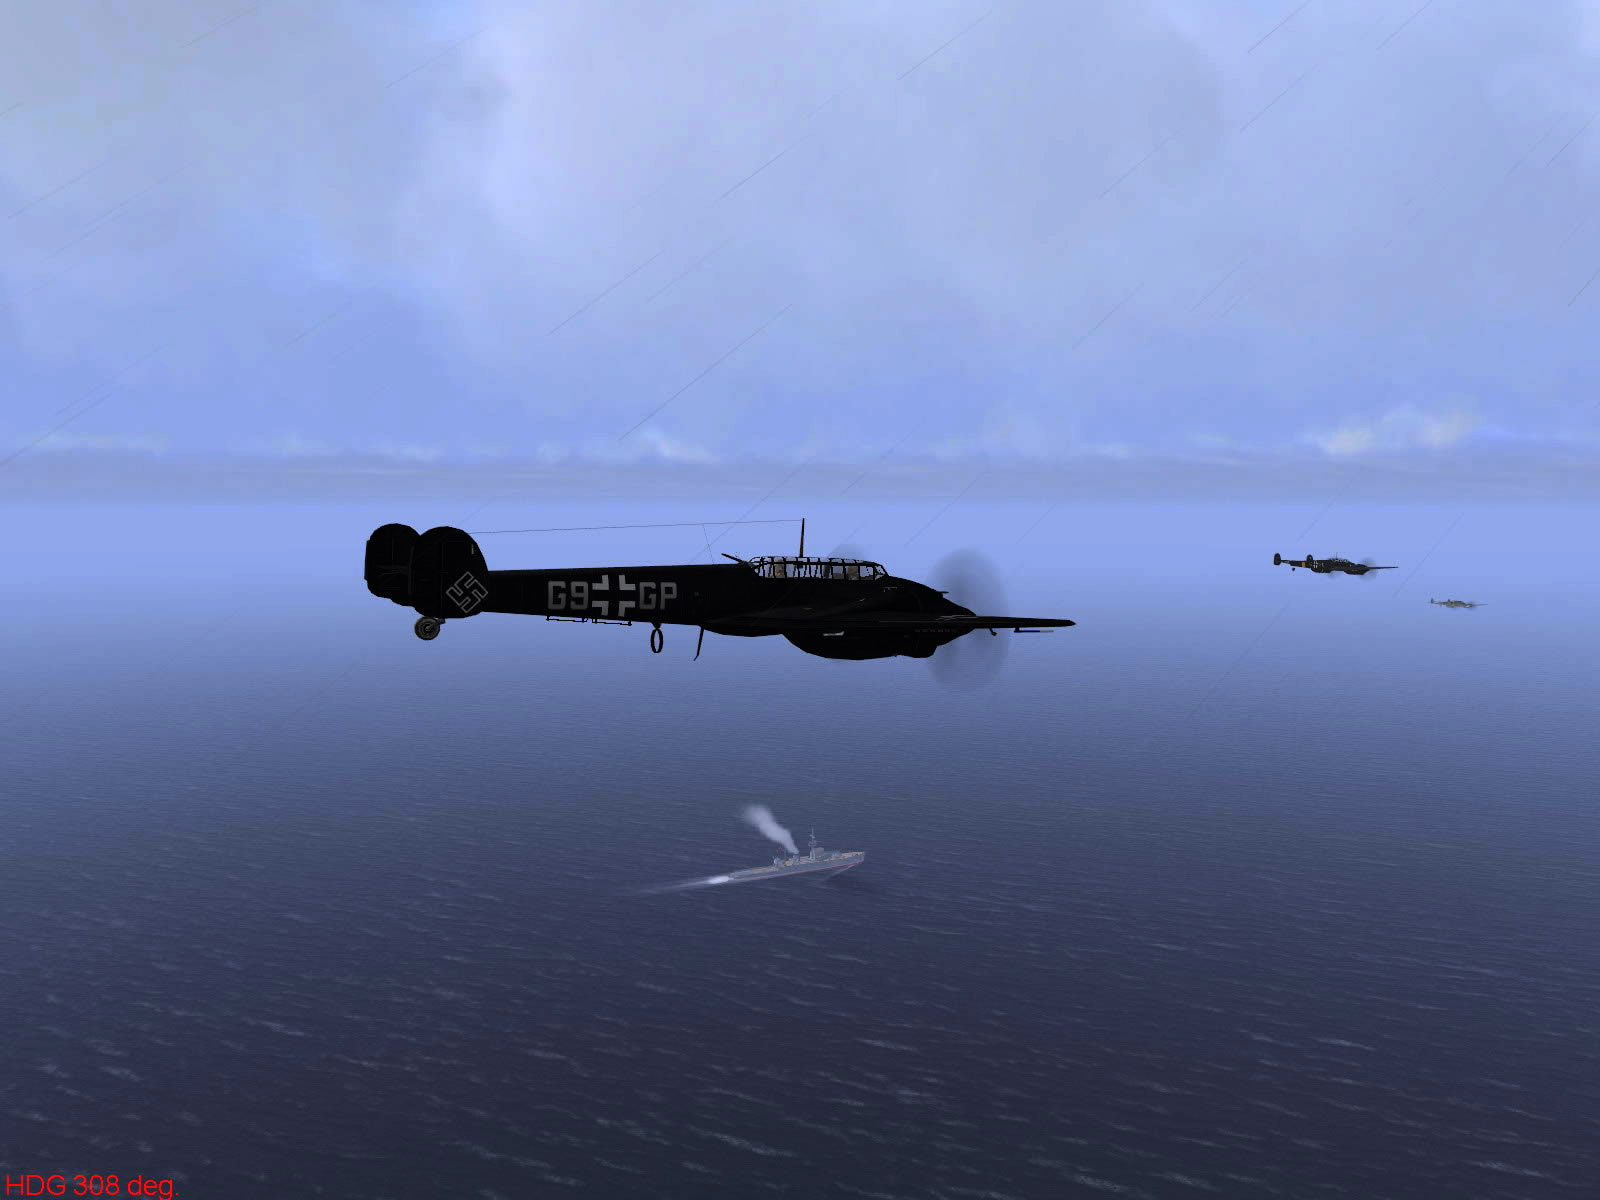 Ubisoft IL2 Sturmovik game version of Operation Donnerkeil 09